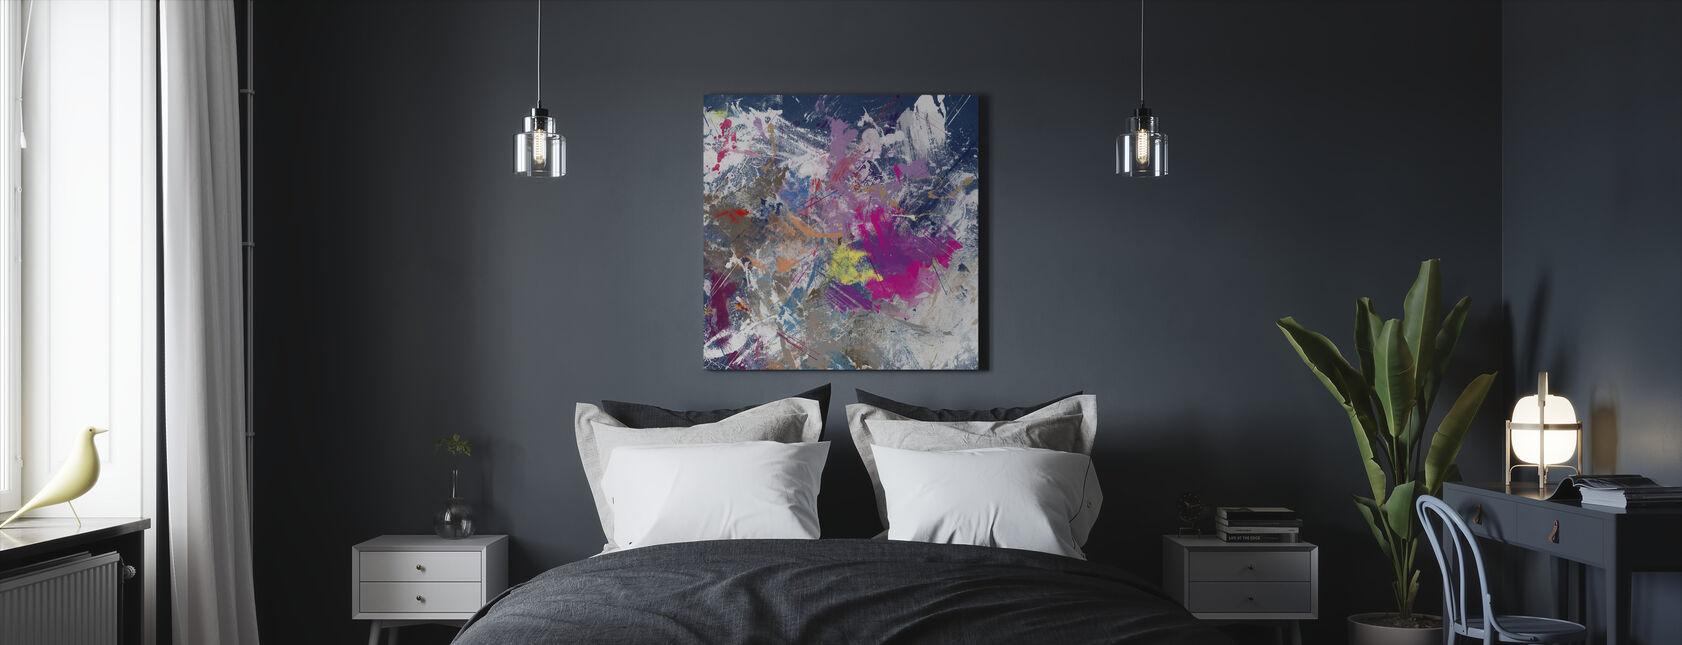 Grunge Color Explotion - Canvas print - Bedroom